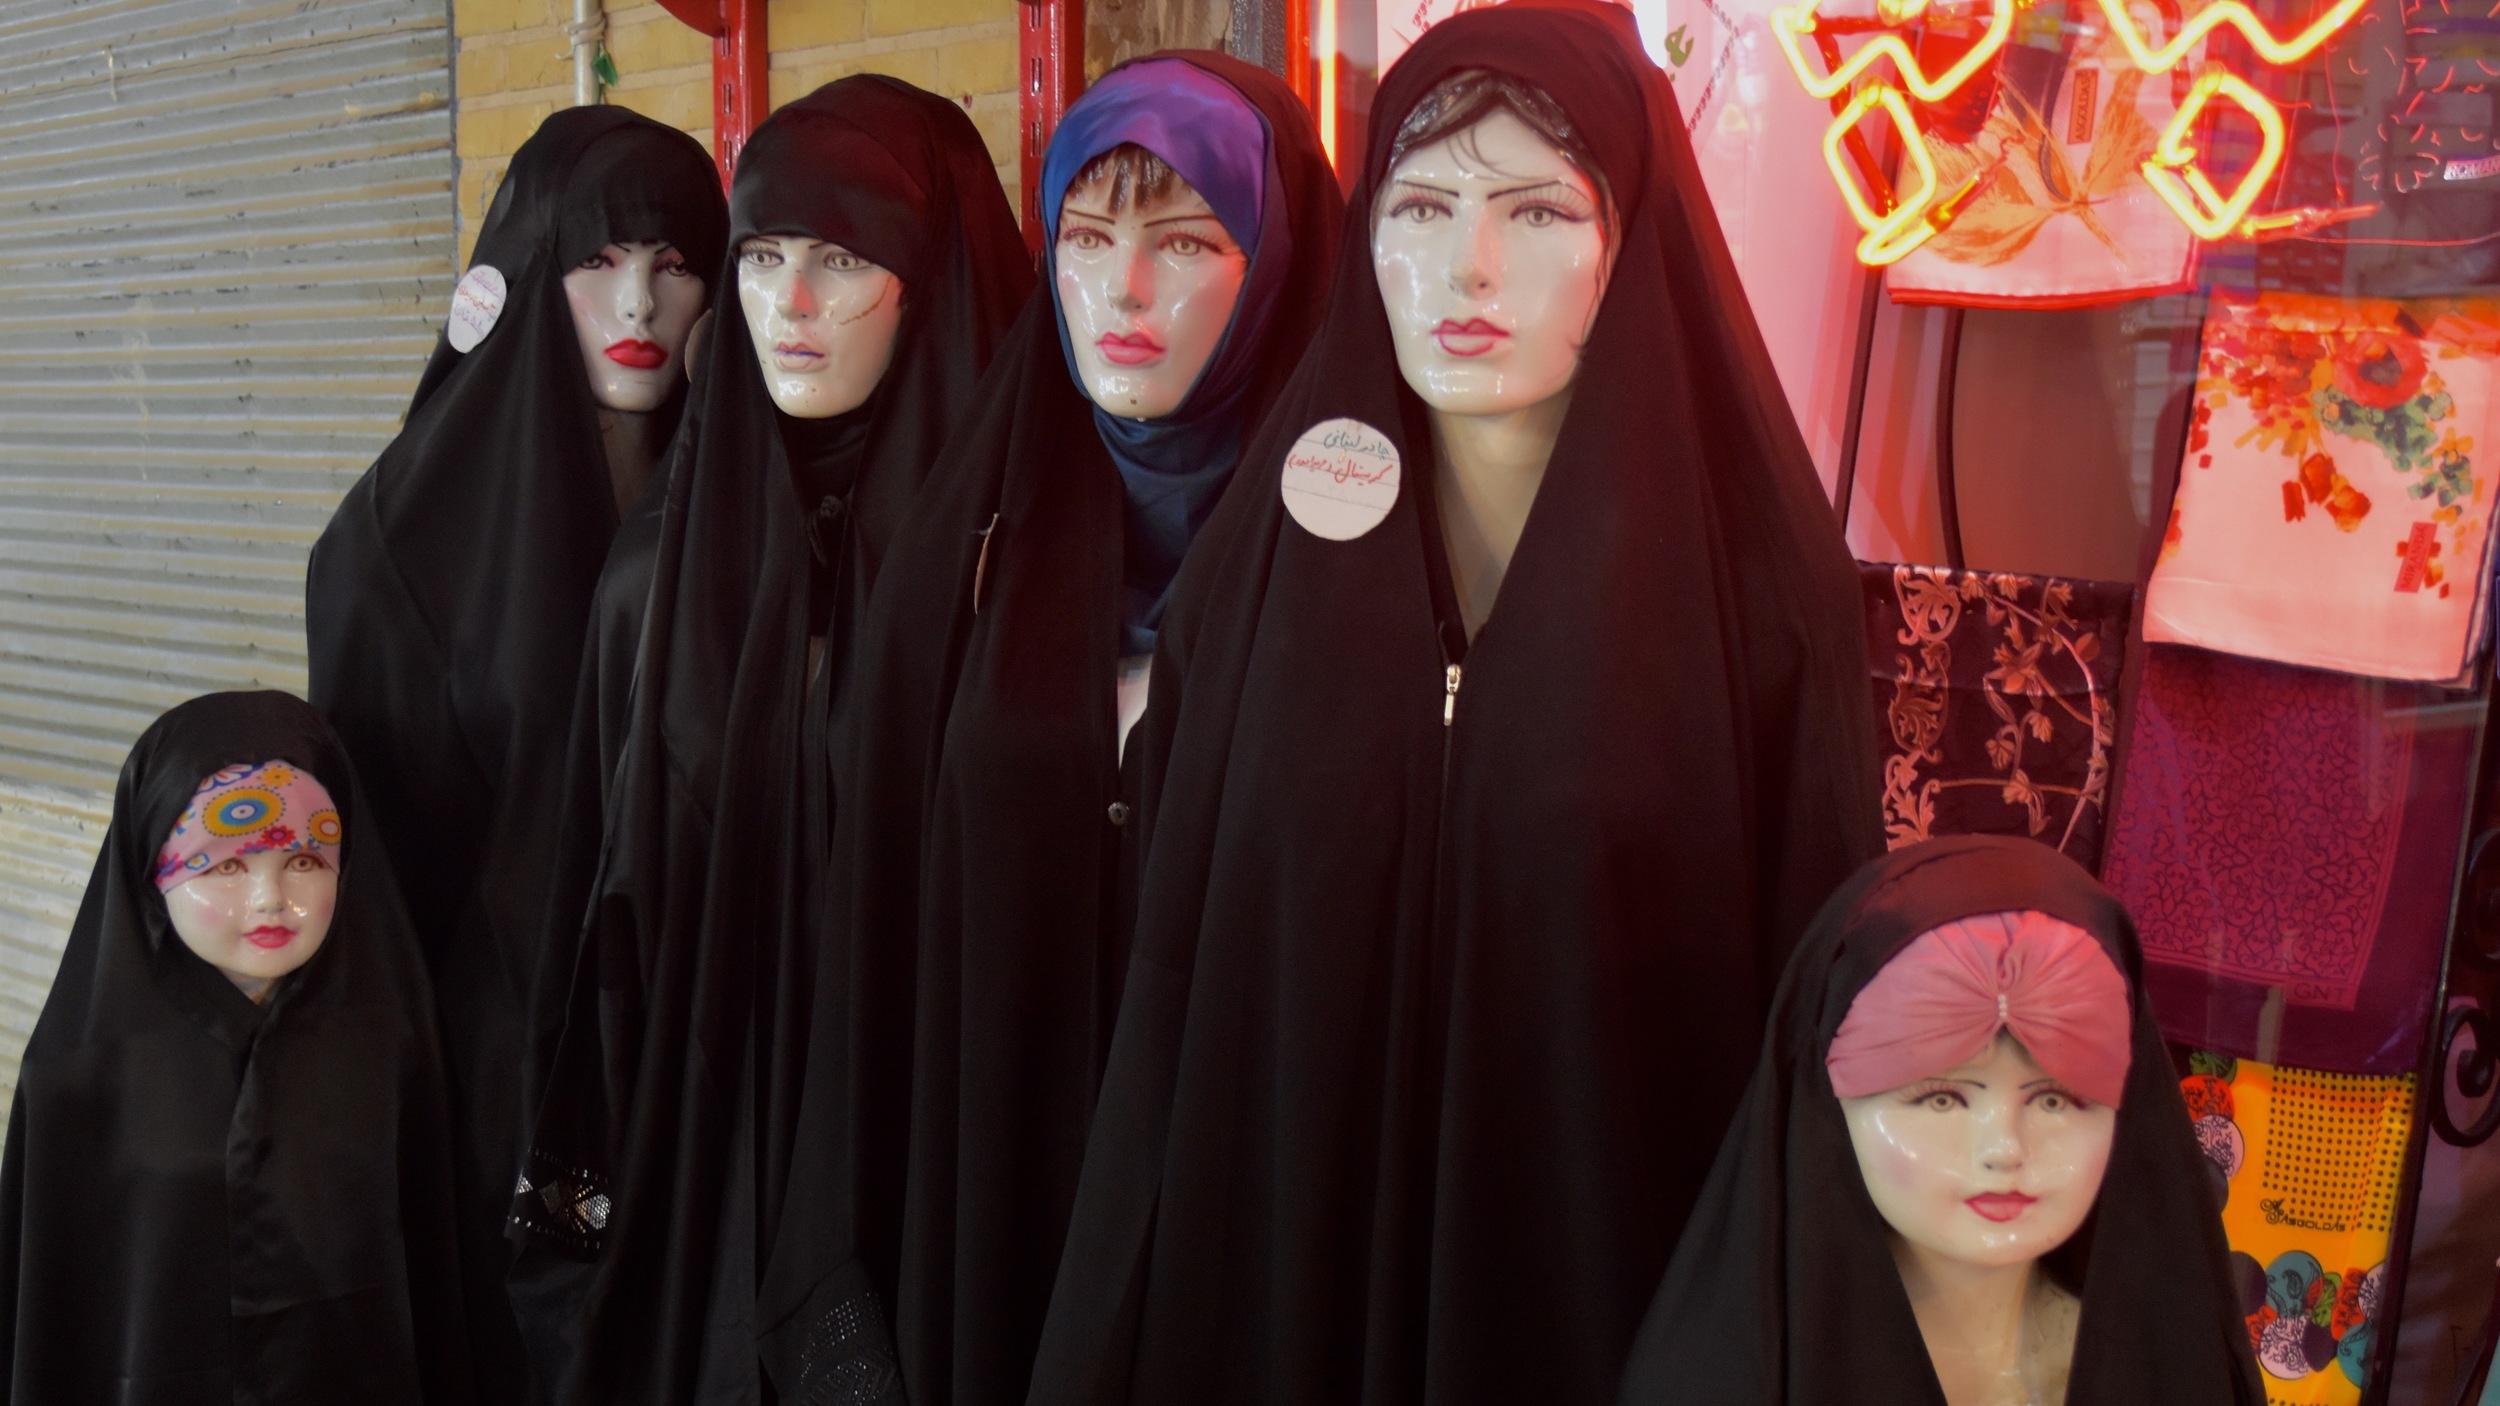 Iran-Kerman-chador-shop.jpg